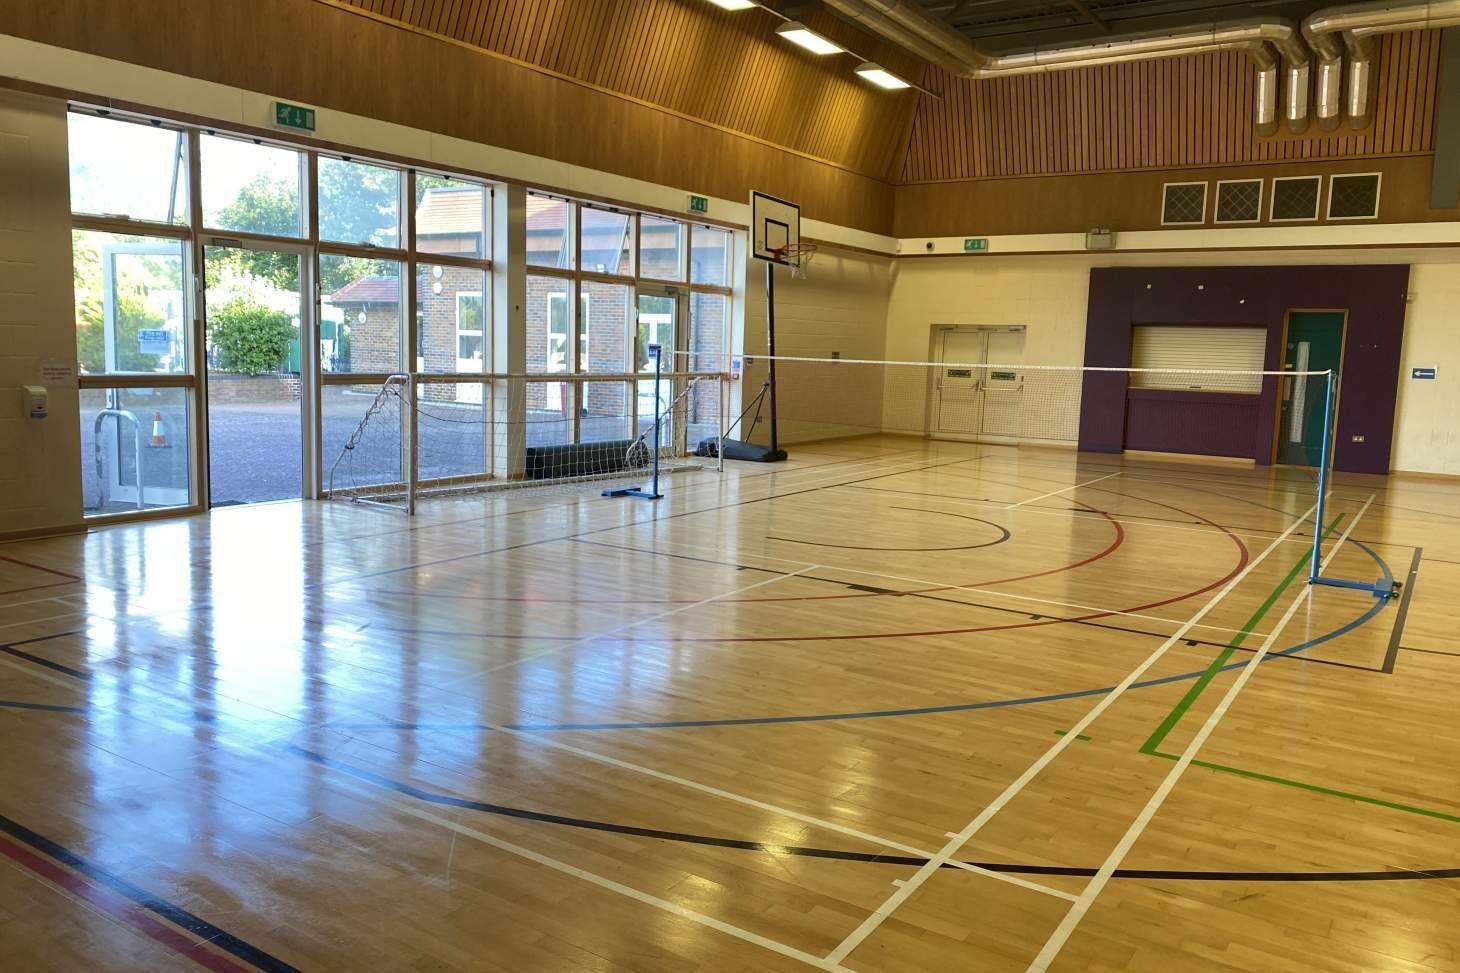 Singh Sabha Sports Centre Court   Sports hall basketball court